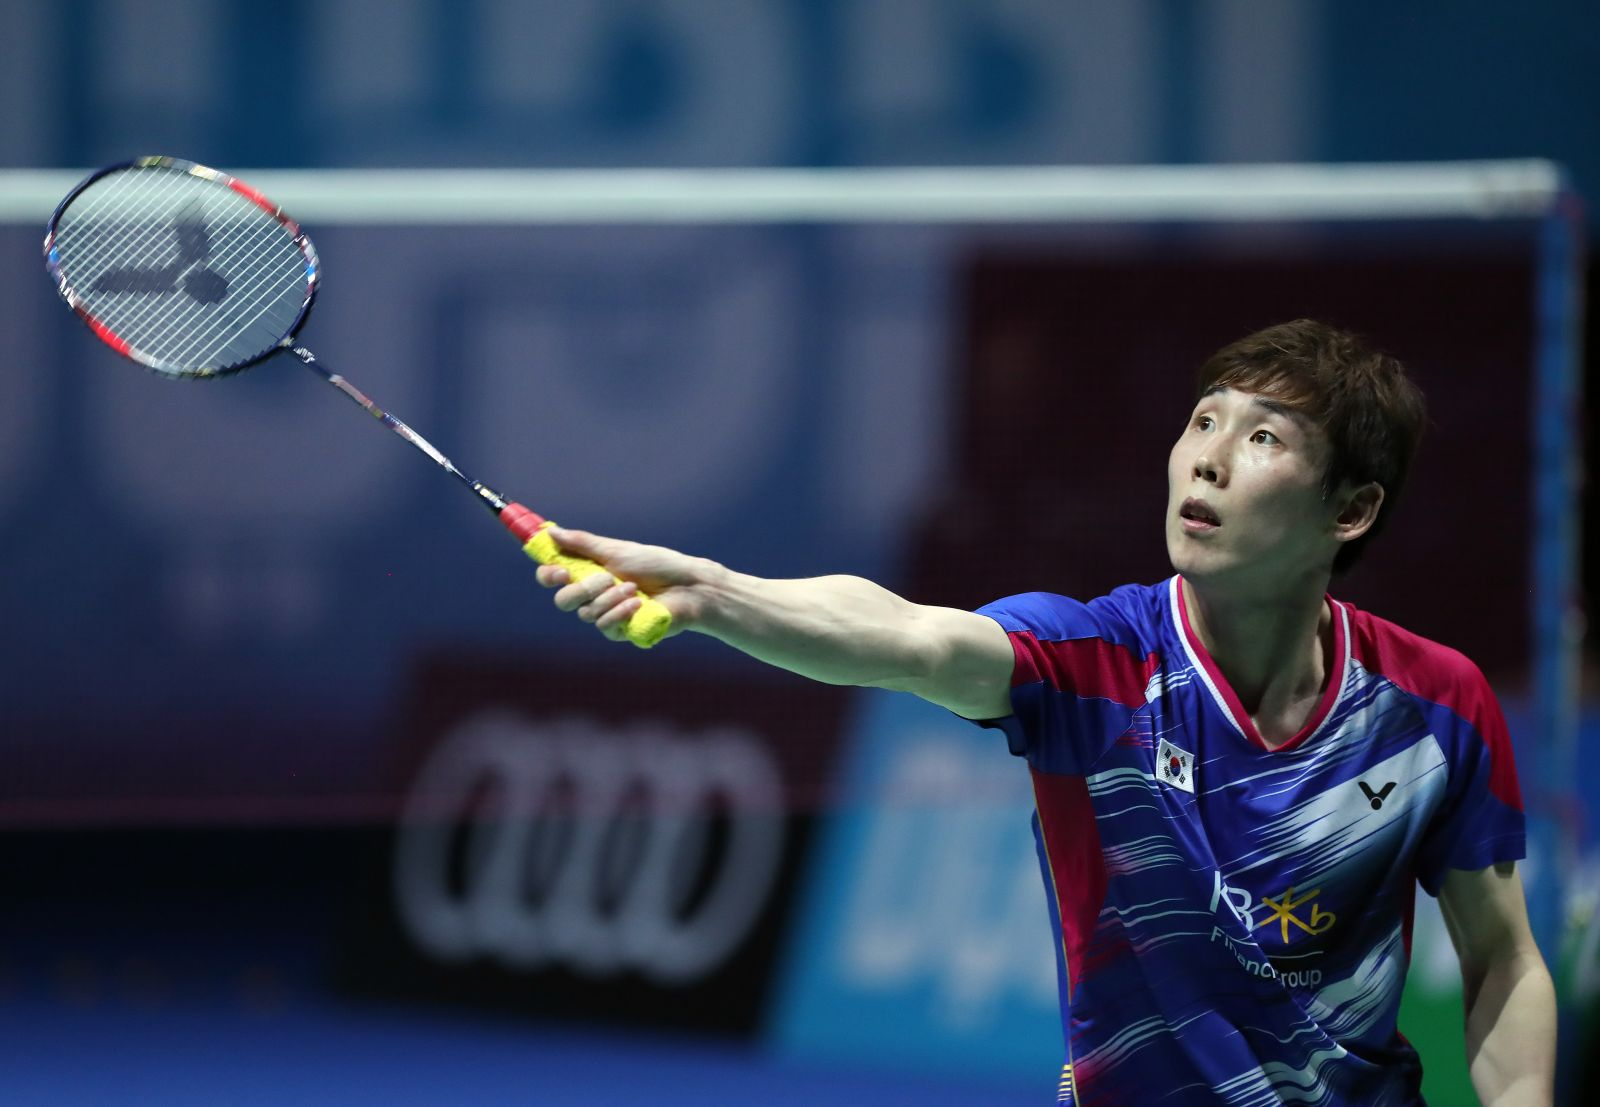 VICTOR RESEARCH LAB HX 900 RACKET VICTOR Badminton